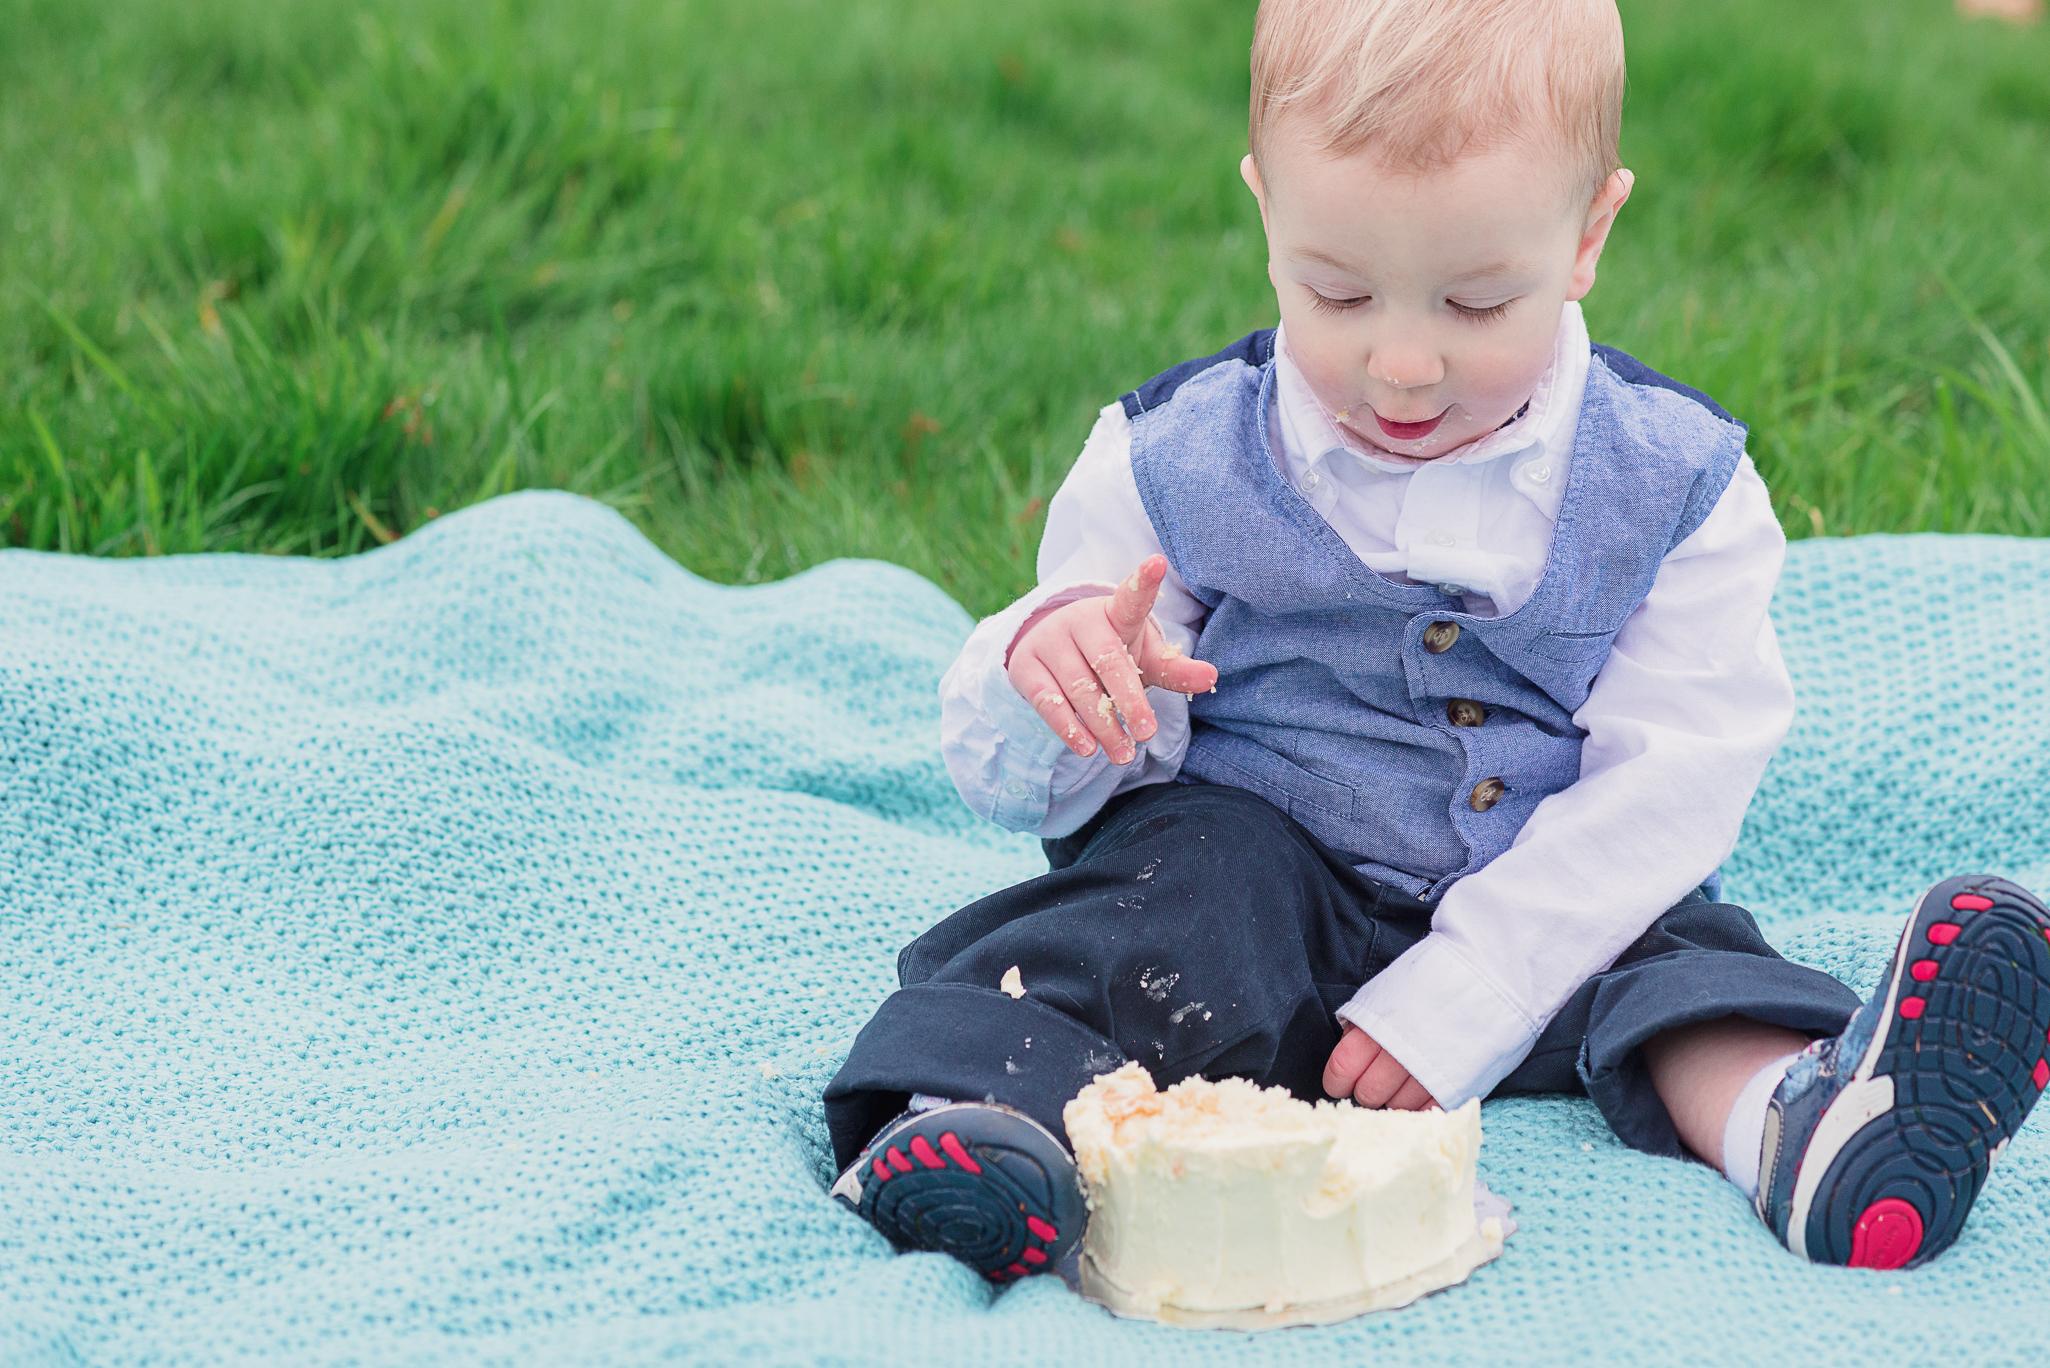 Nicola_Reiersen_Family_Photographer_Victoria_BC_Cake_Smash.jpg